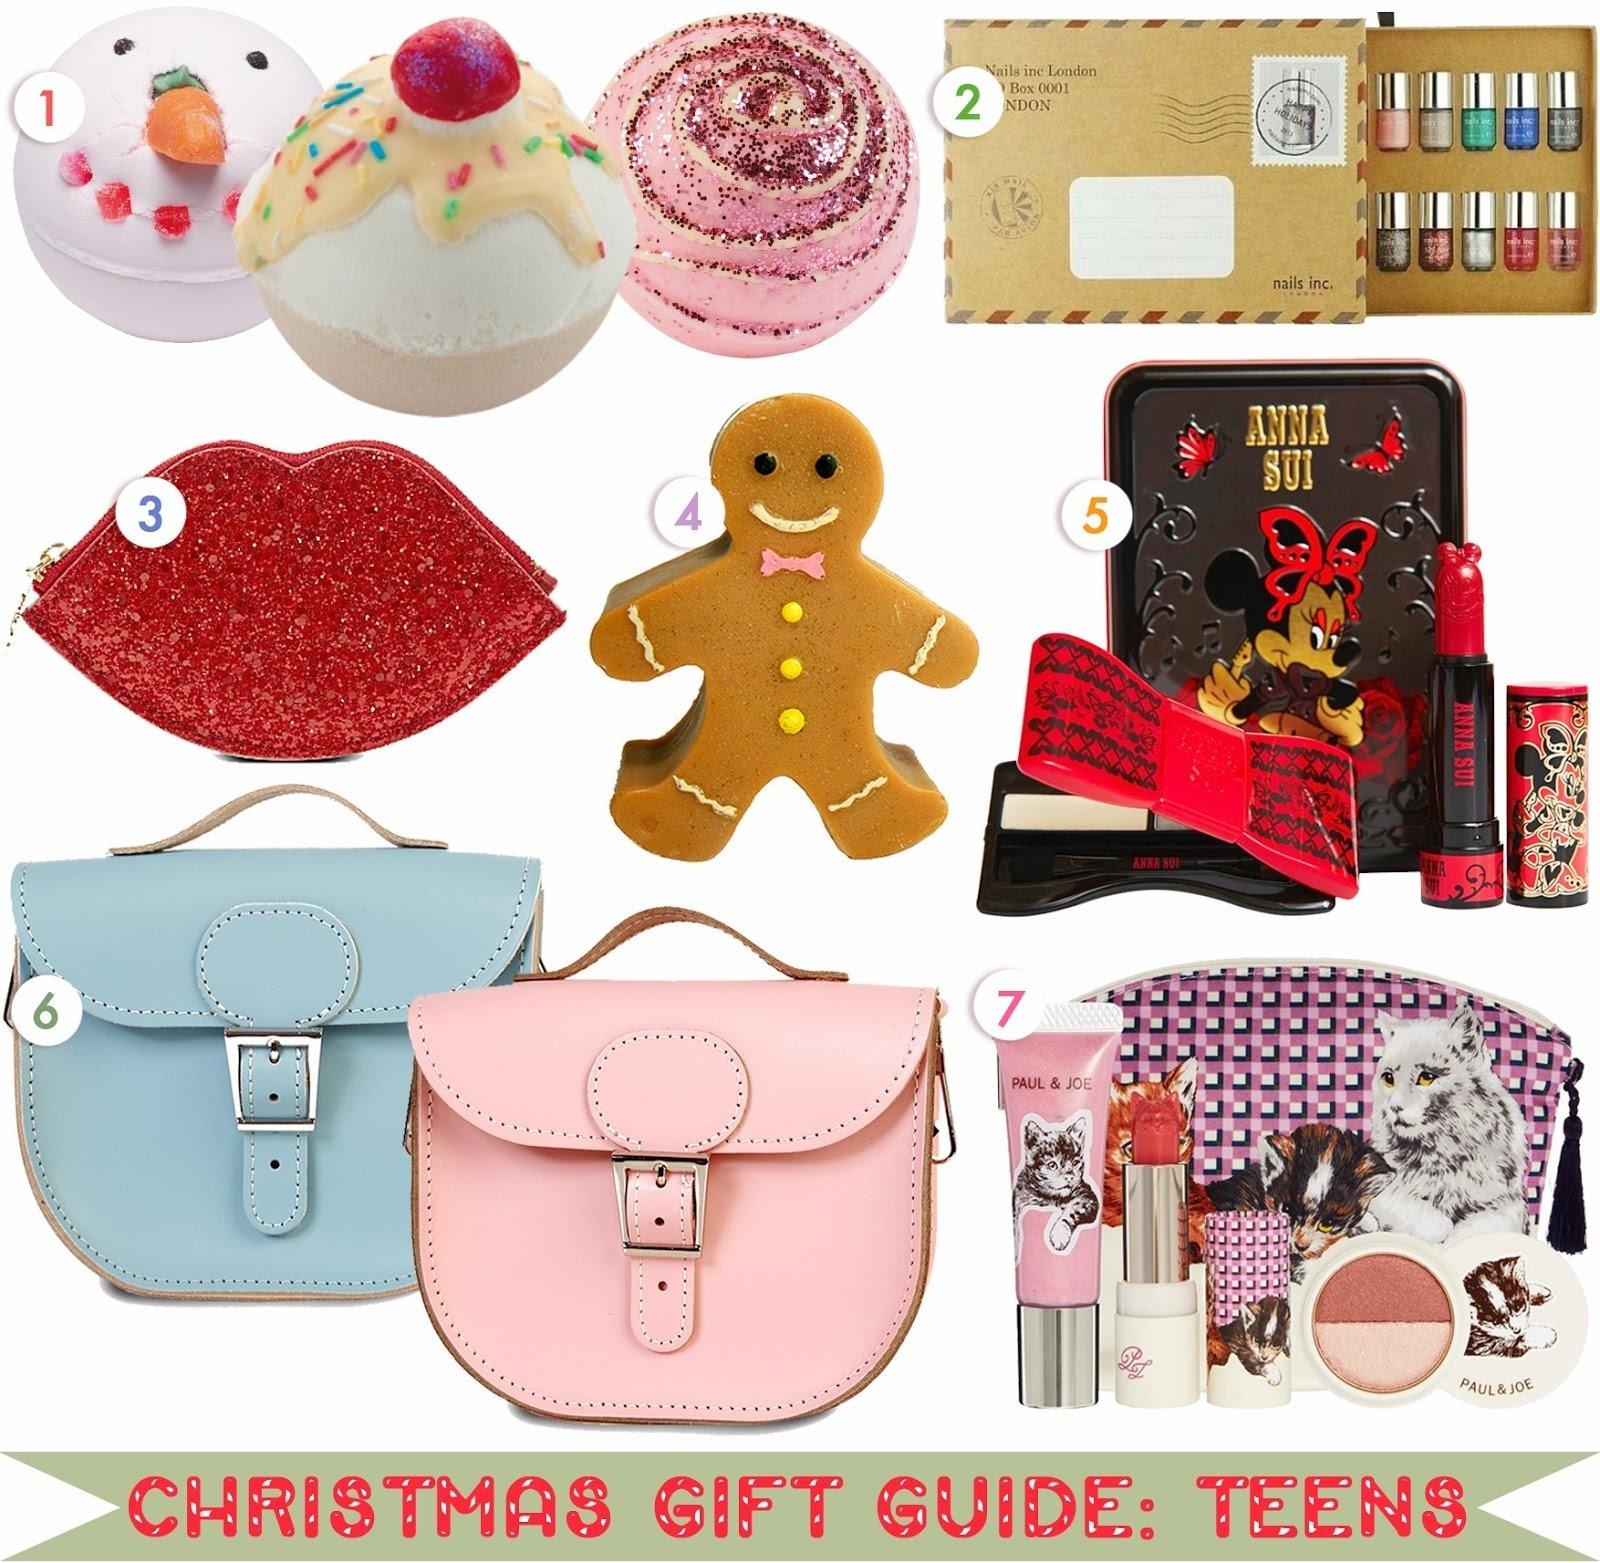 10 Lovable Christmas Present Ideas For Sister christmas gift guide teens temporarysecretary uk fashion 2 2020